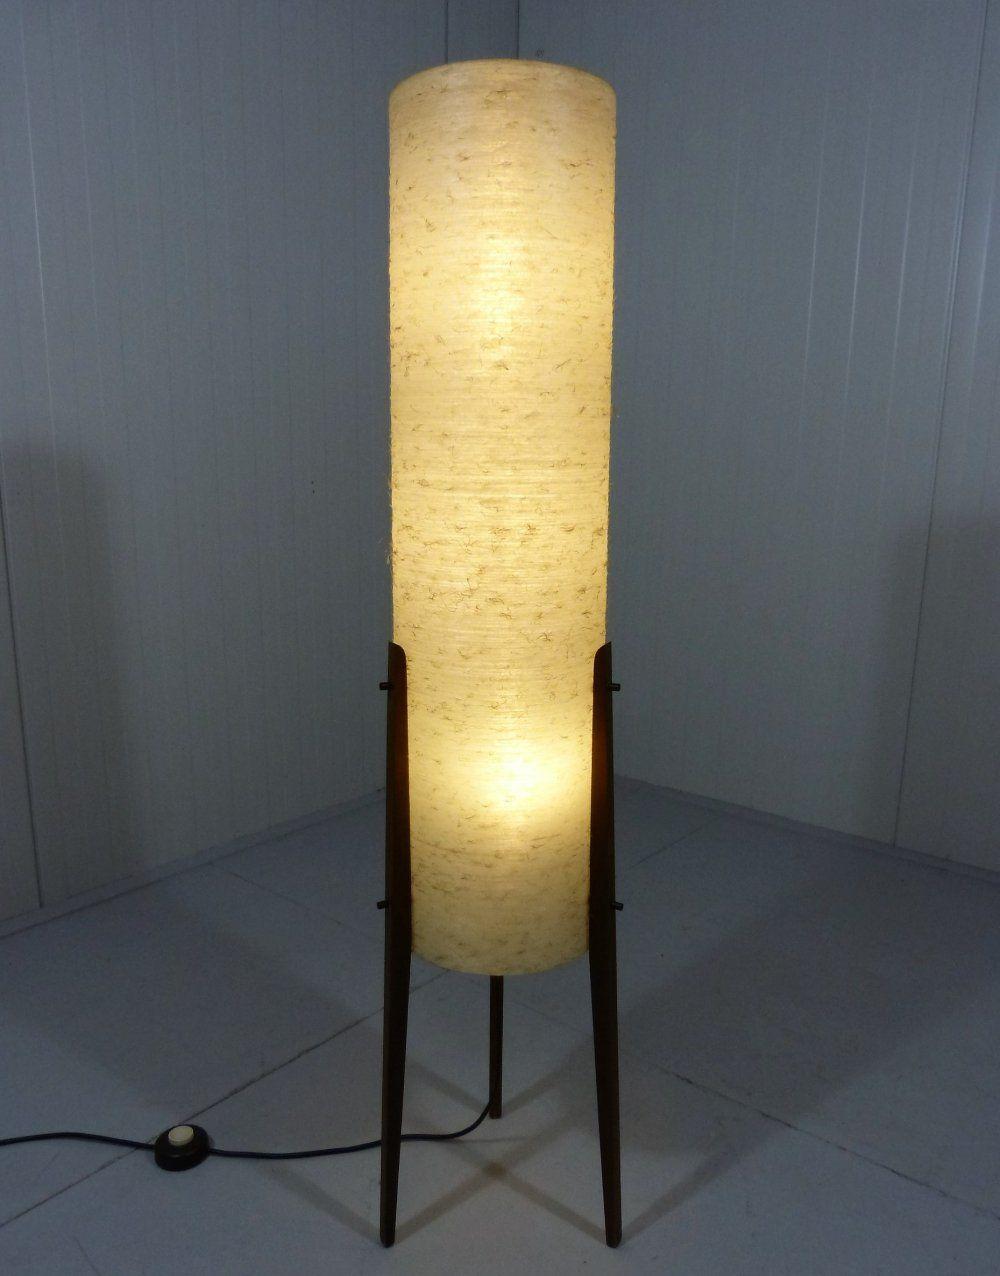 For Sale Rocket Floor Lamp In Teak Fiberglass 1950 S Wood Lamp Design Lamp Acrylic Floor Lamp